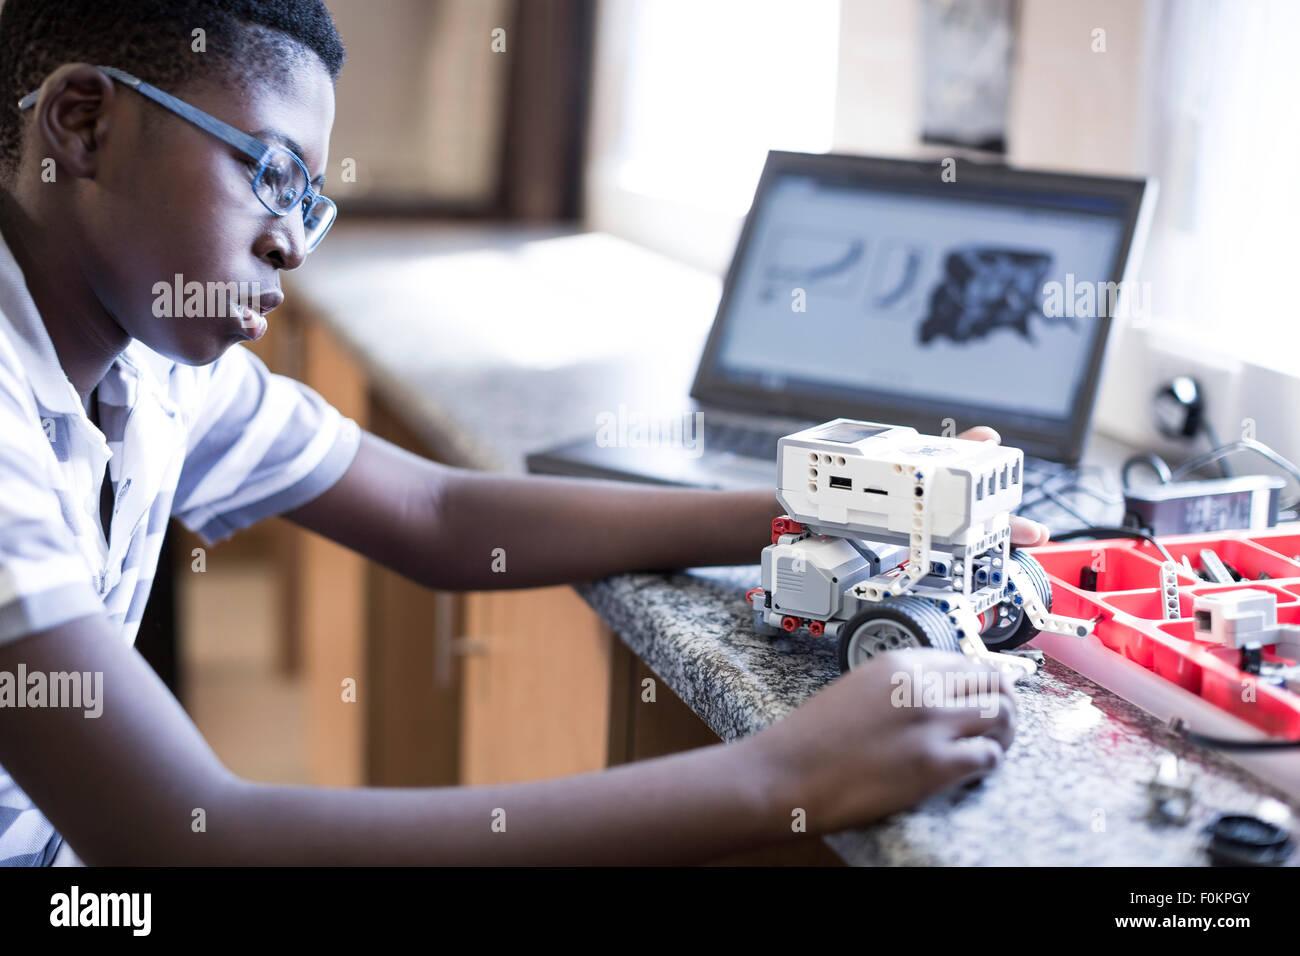 Schüler mit Laptop in der Robotik-Klasse Stockbild